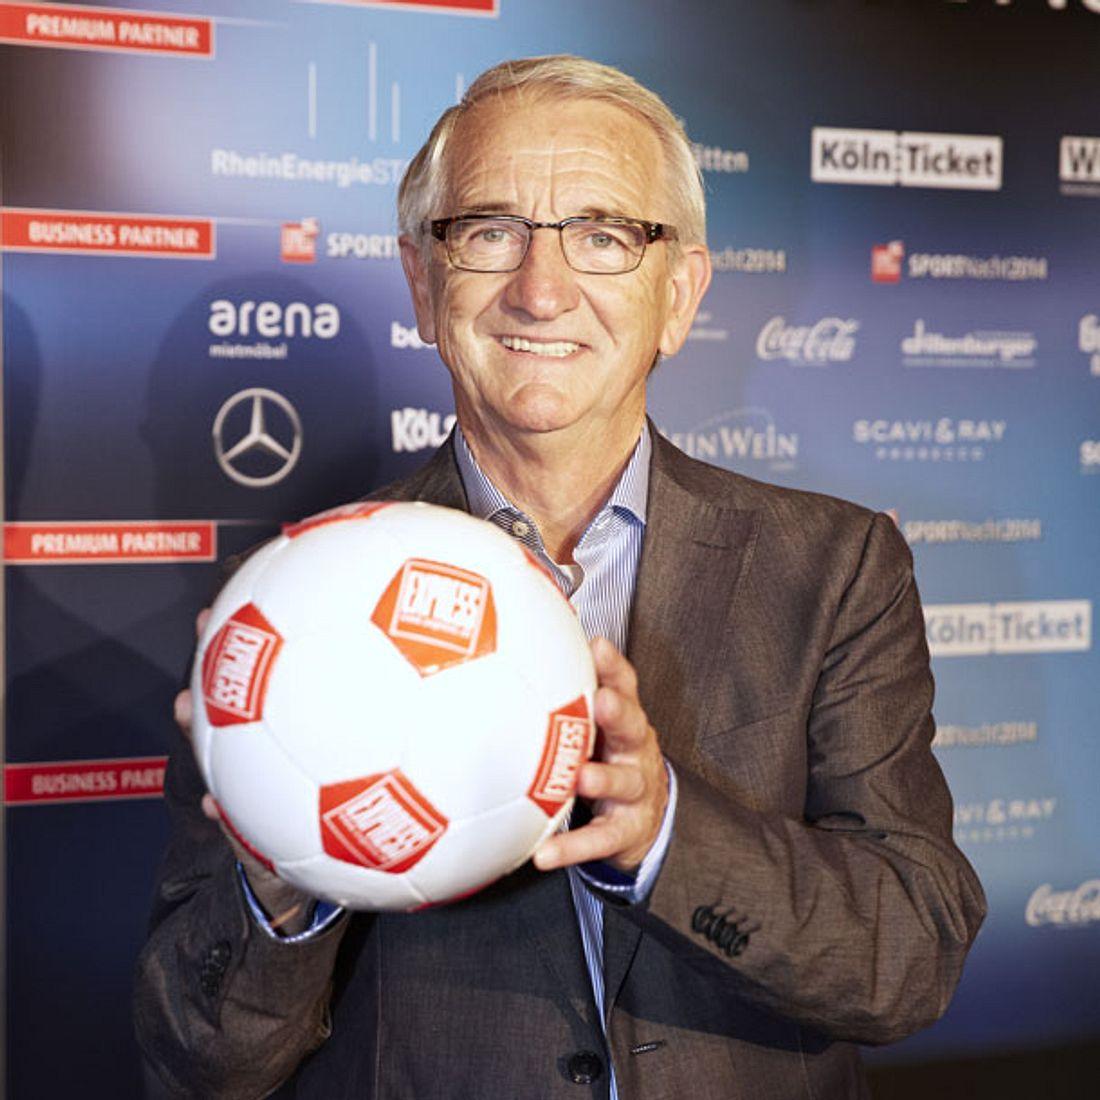 Hannes Löhr tot